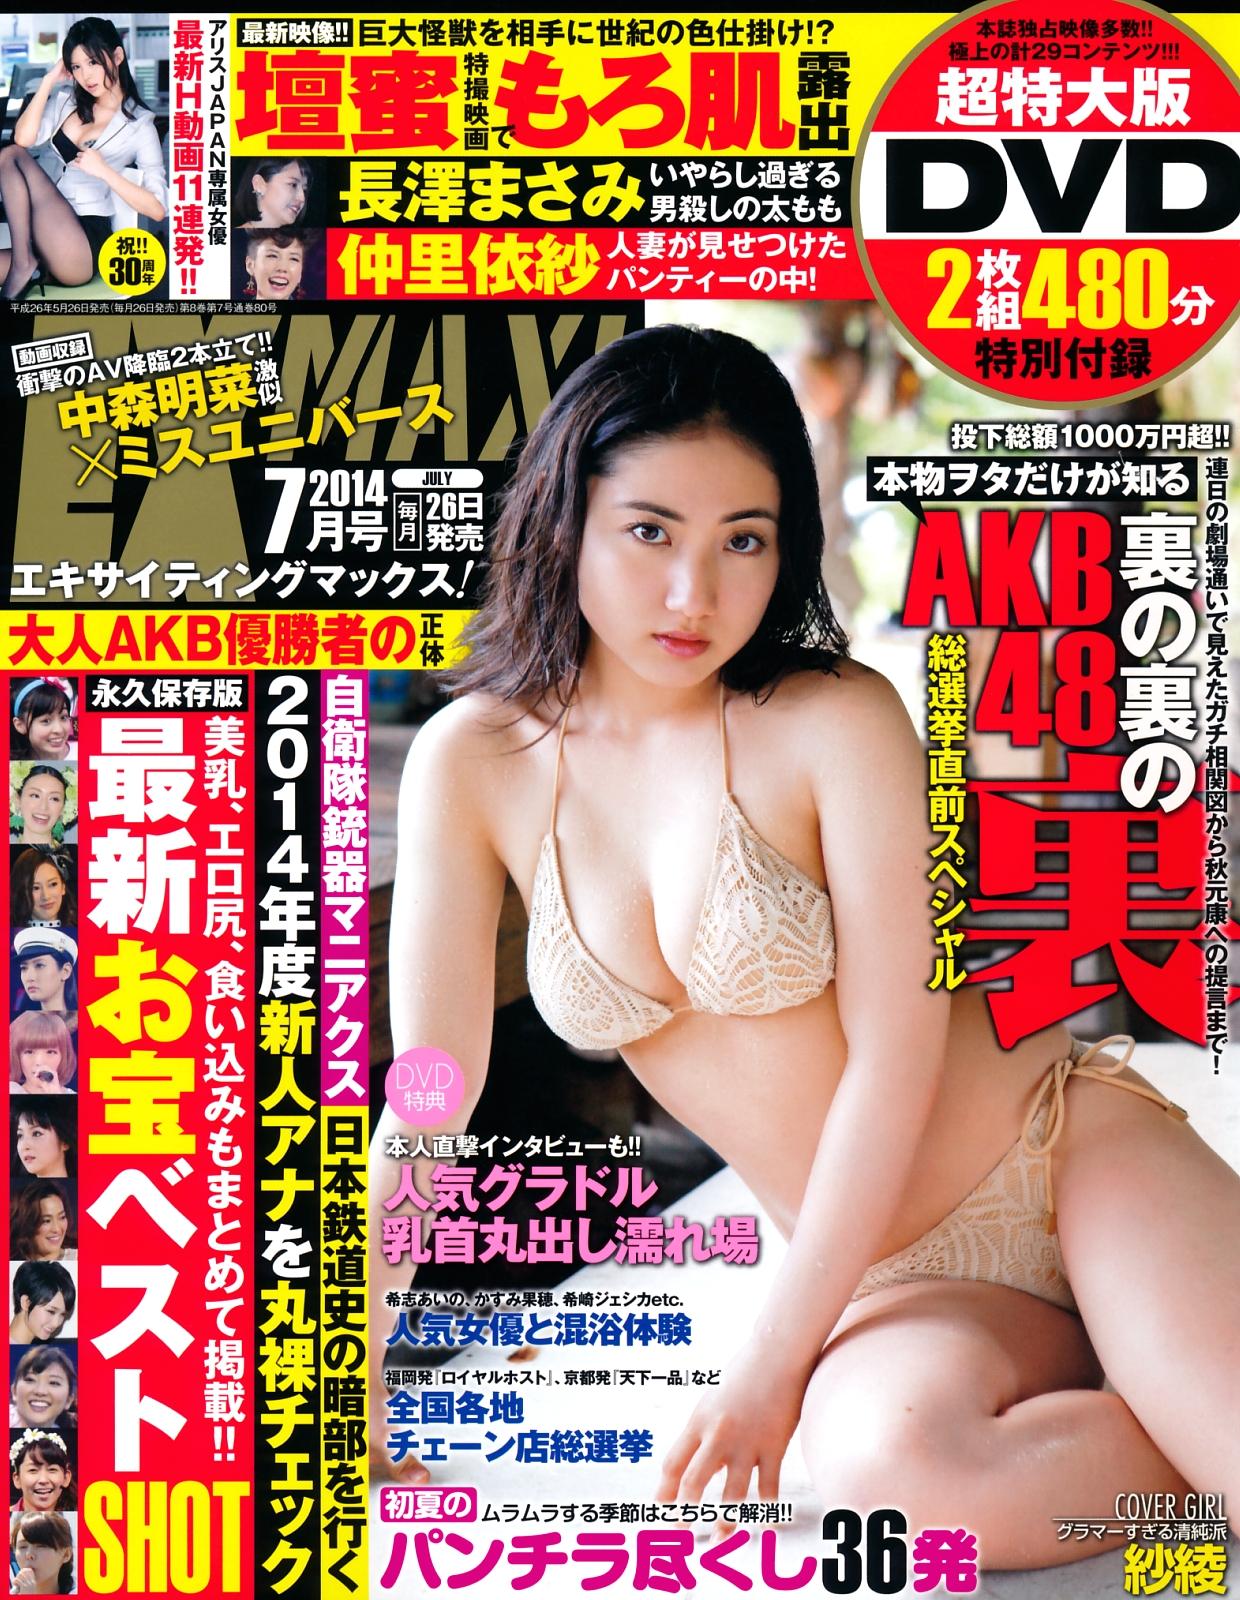 EXMAX201407_cover.jpg